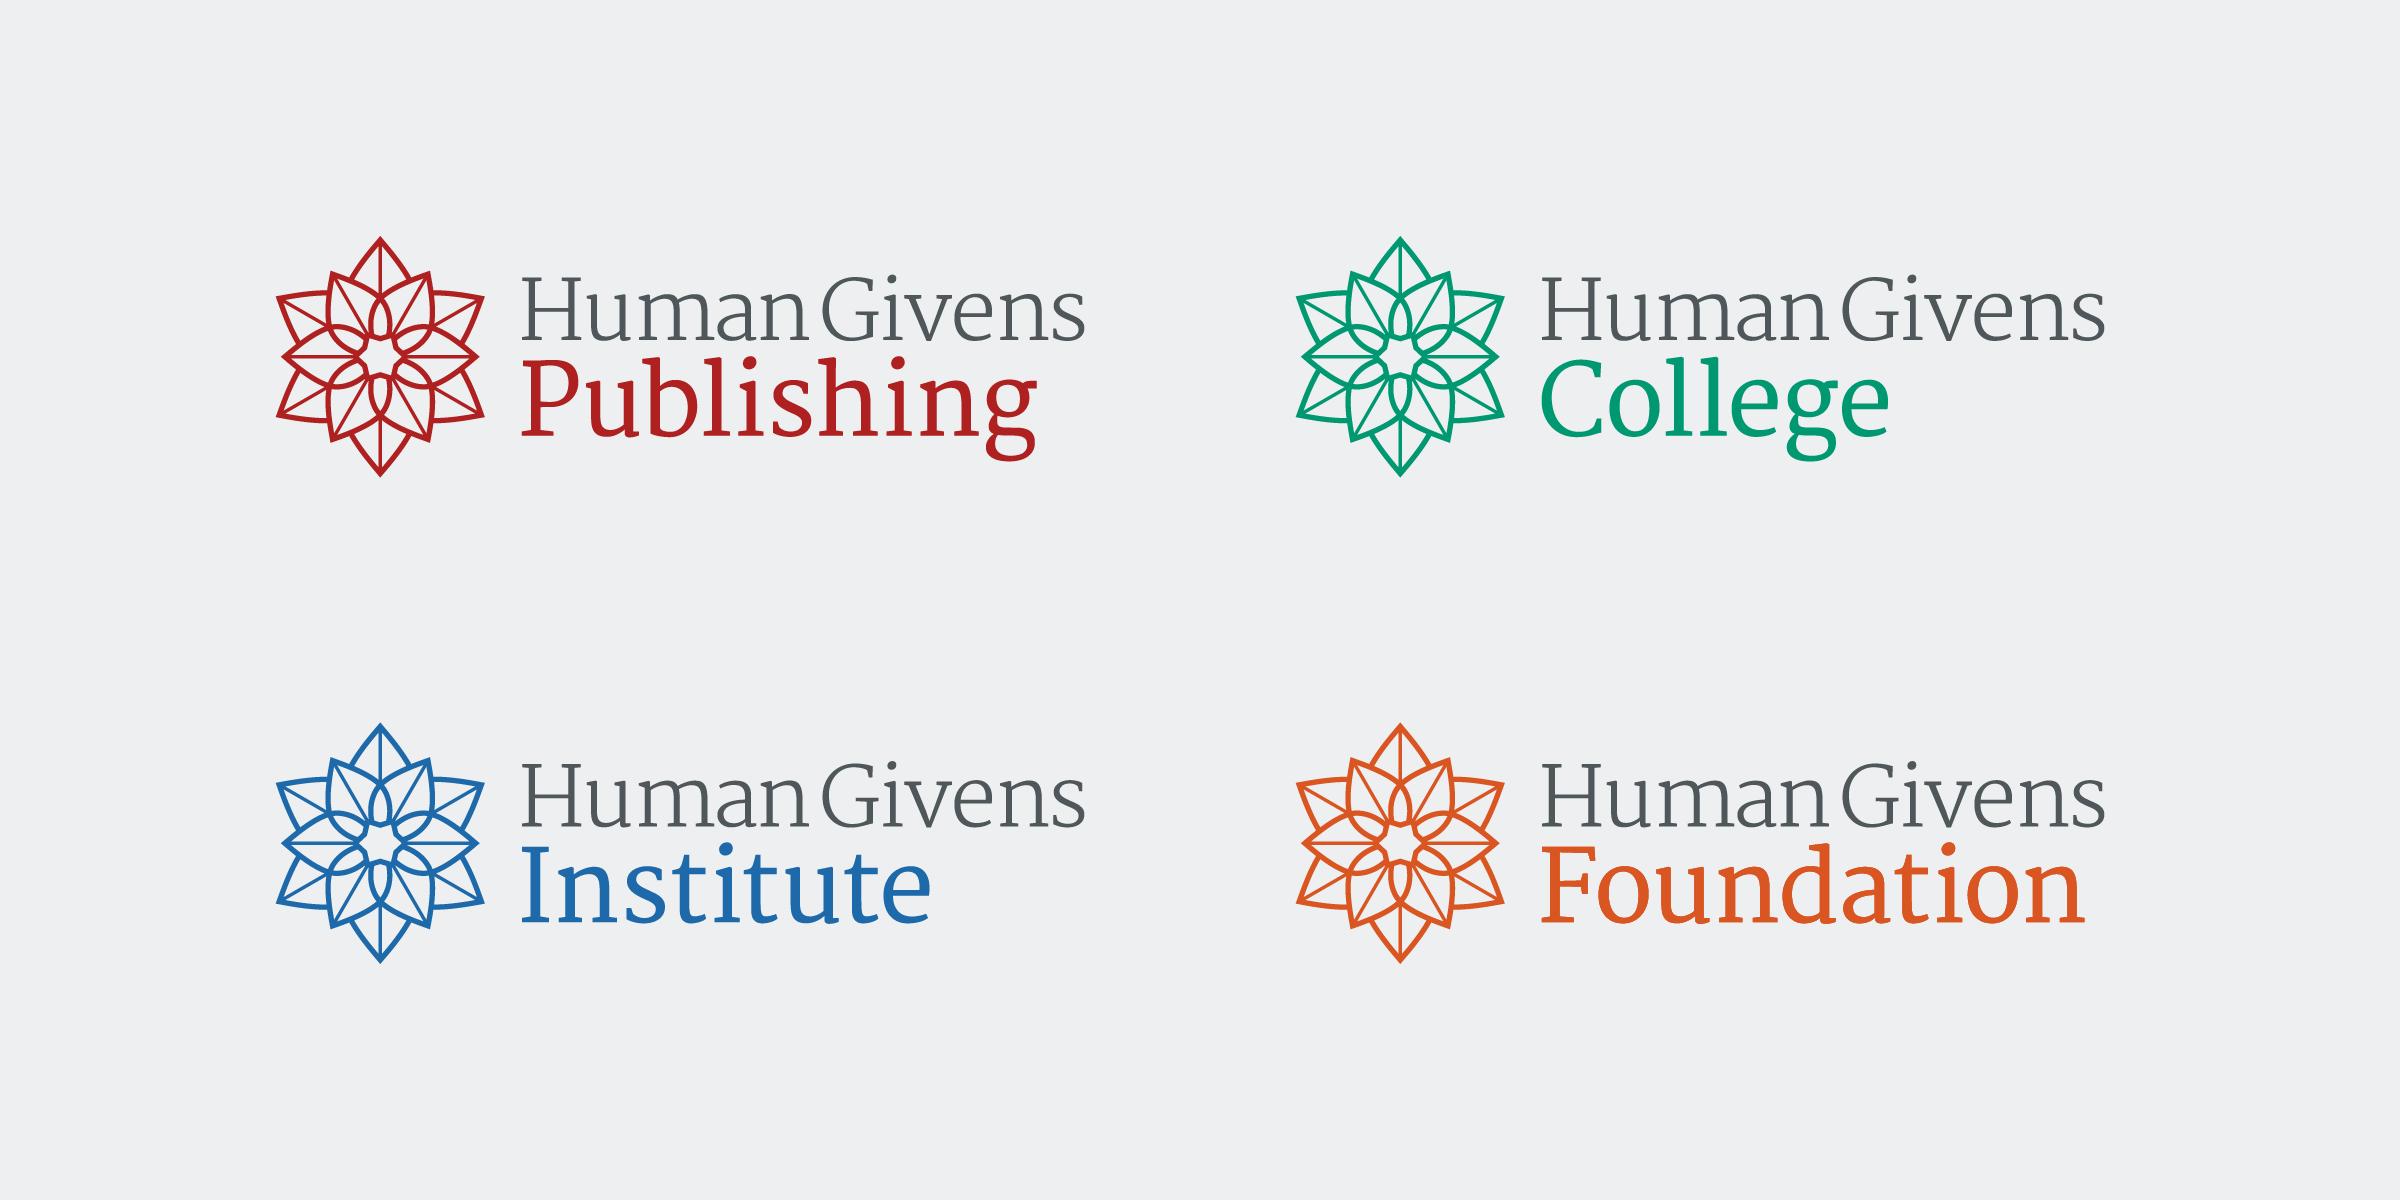 Human Givens brand identity